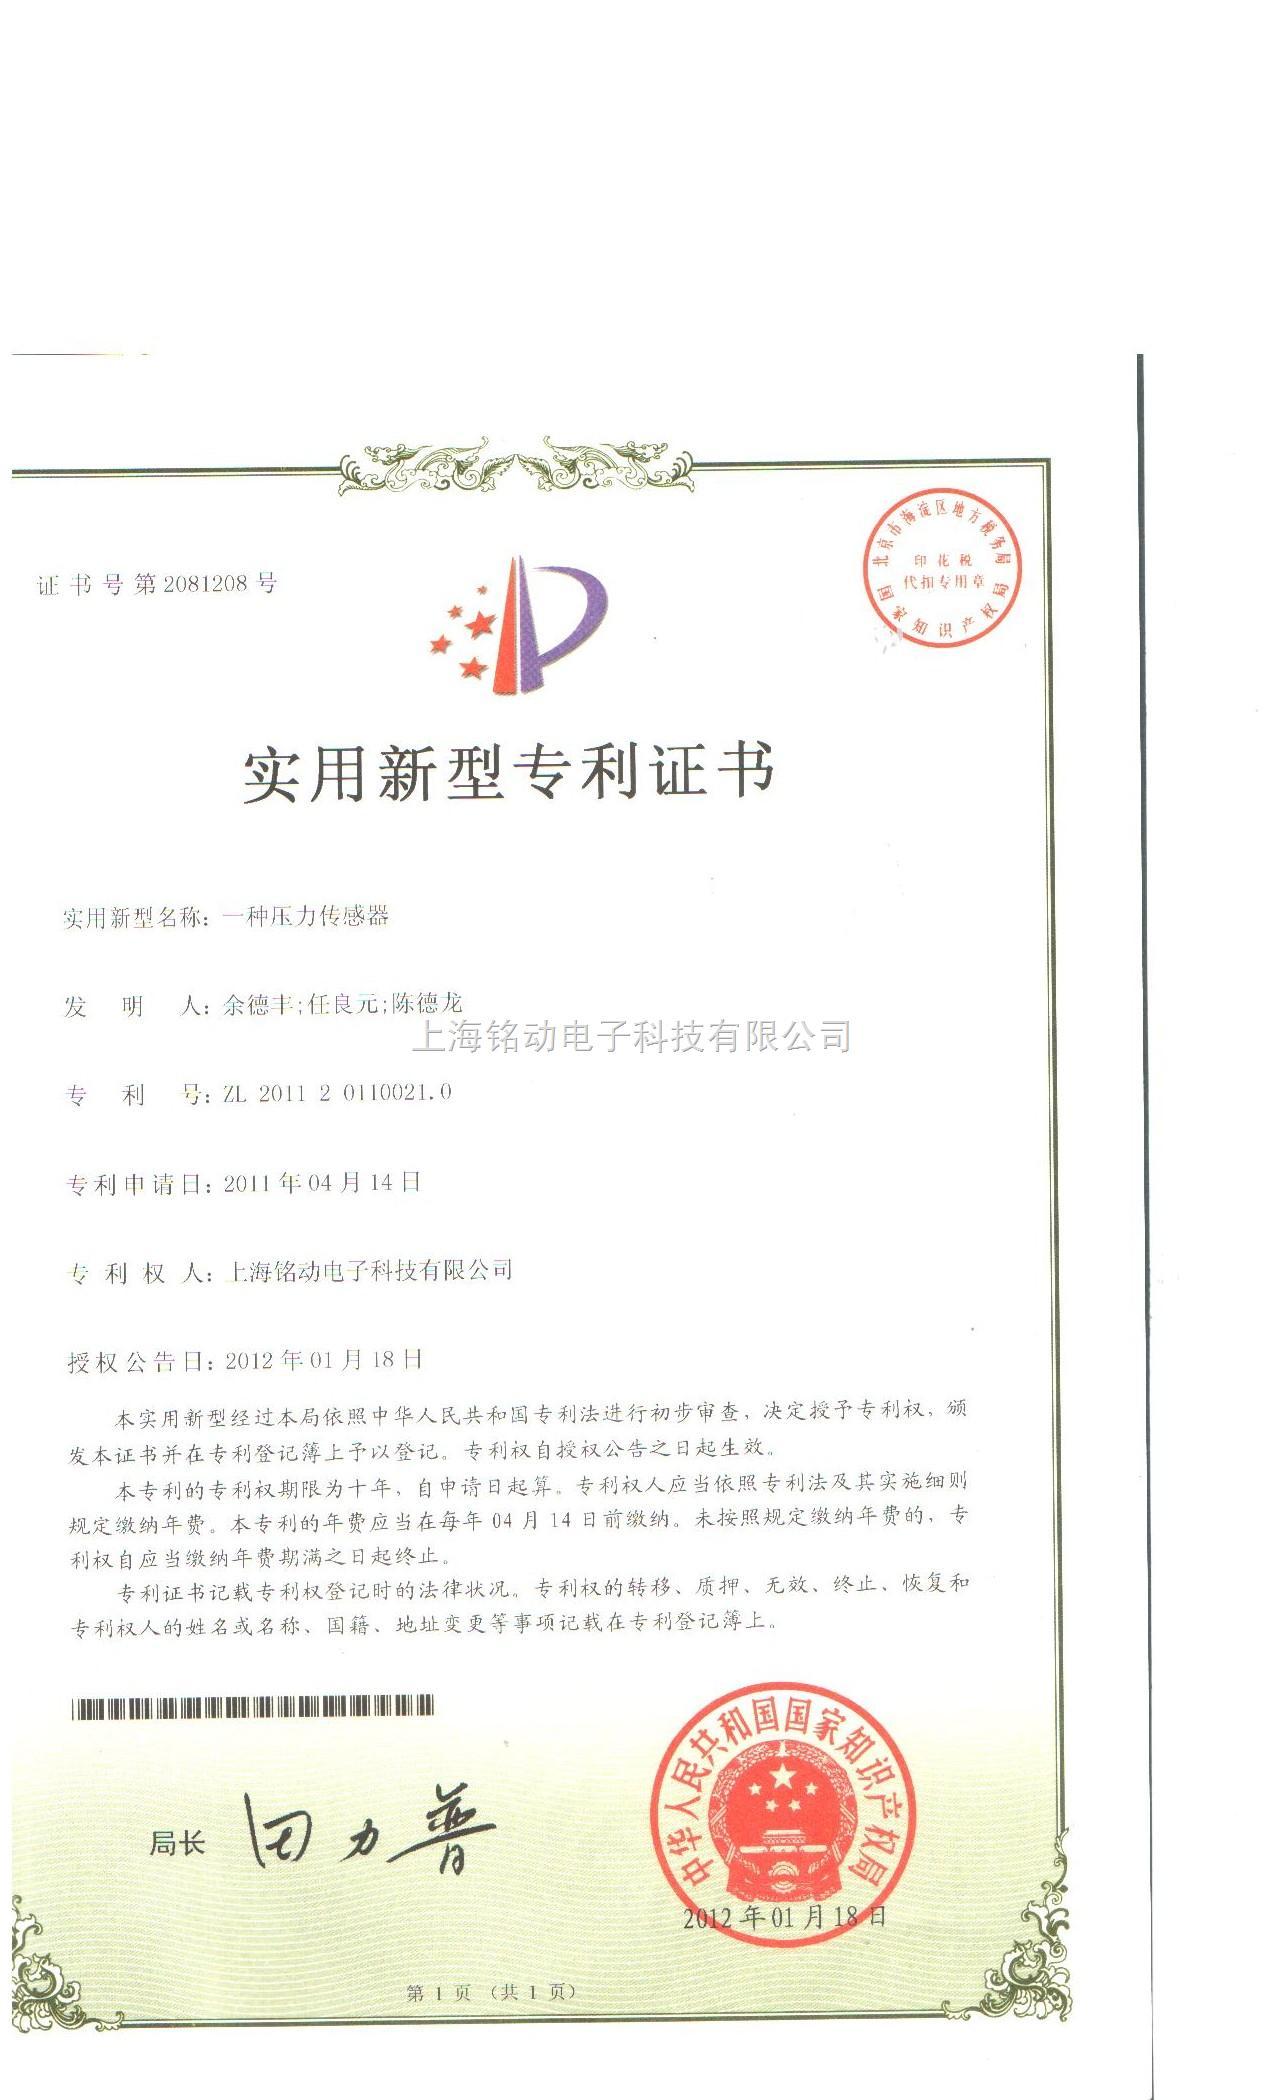 MD-PS系列证书